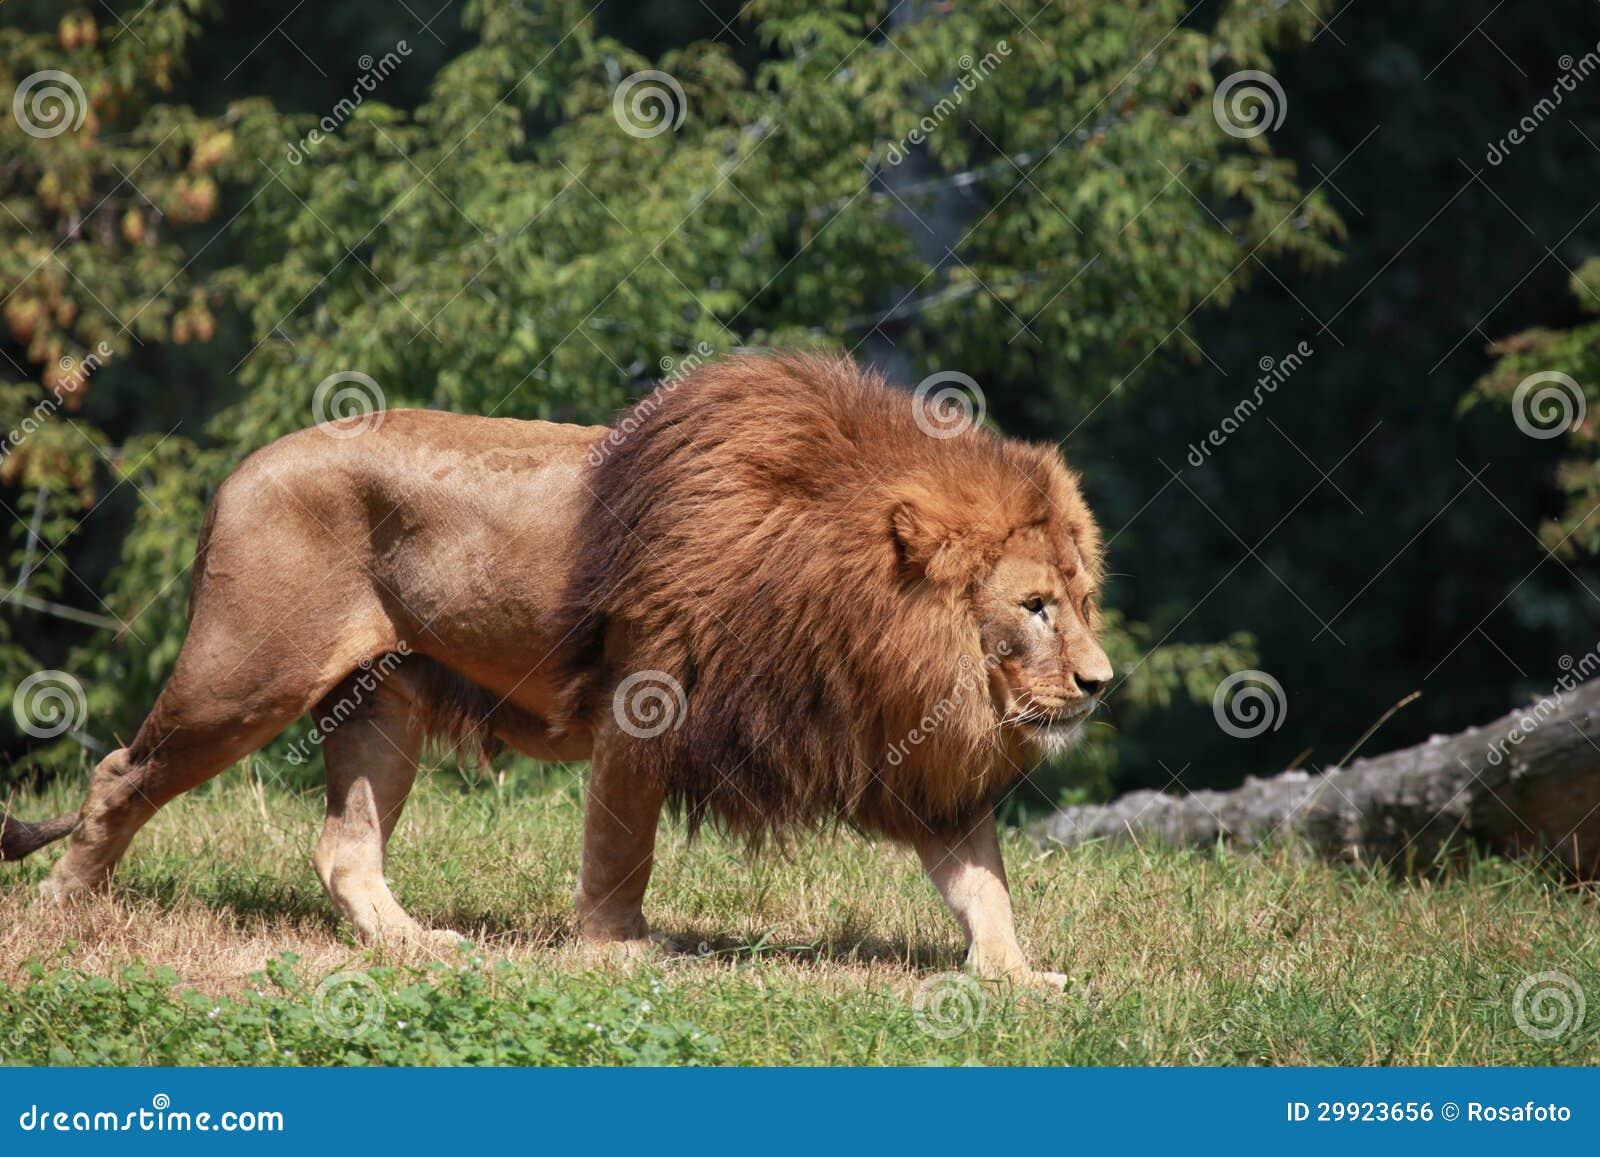 Lion Walking In Zoo Enclosure Stock Photo - Image of animal, walk